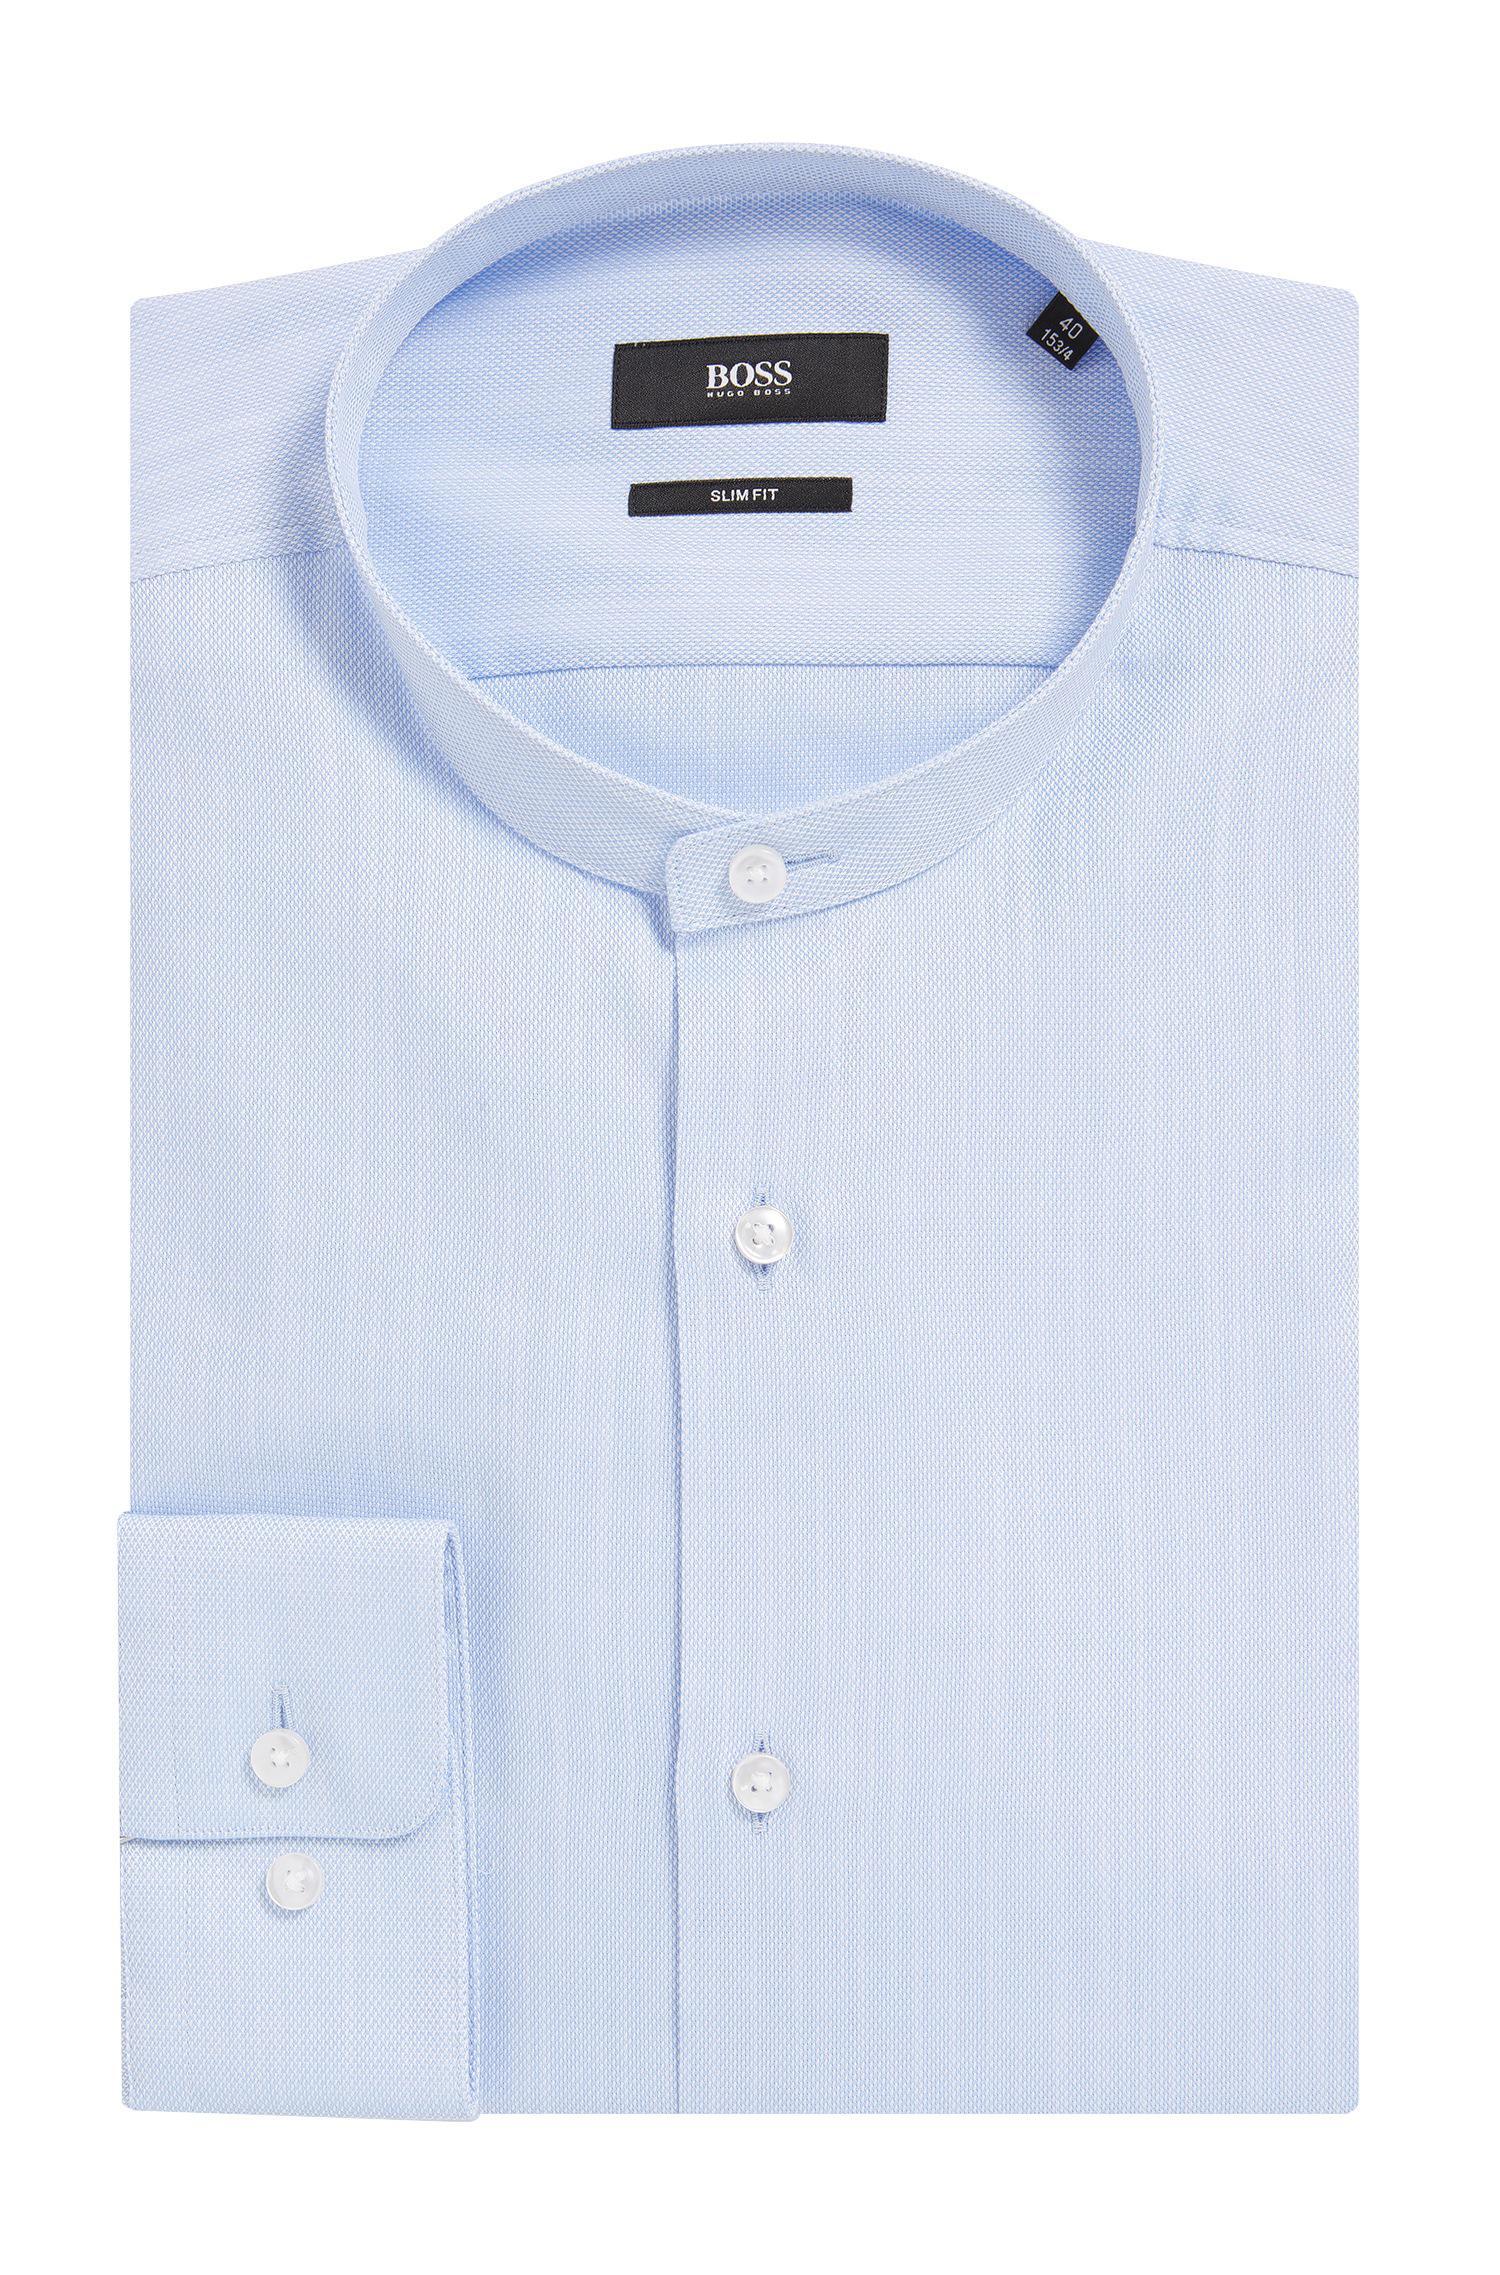 177be5519 BOSS Cotton Dress Shirt, Slim Fit   Jordi in Blue for Men - Lyst